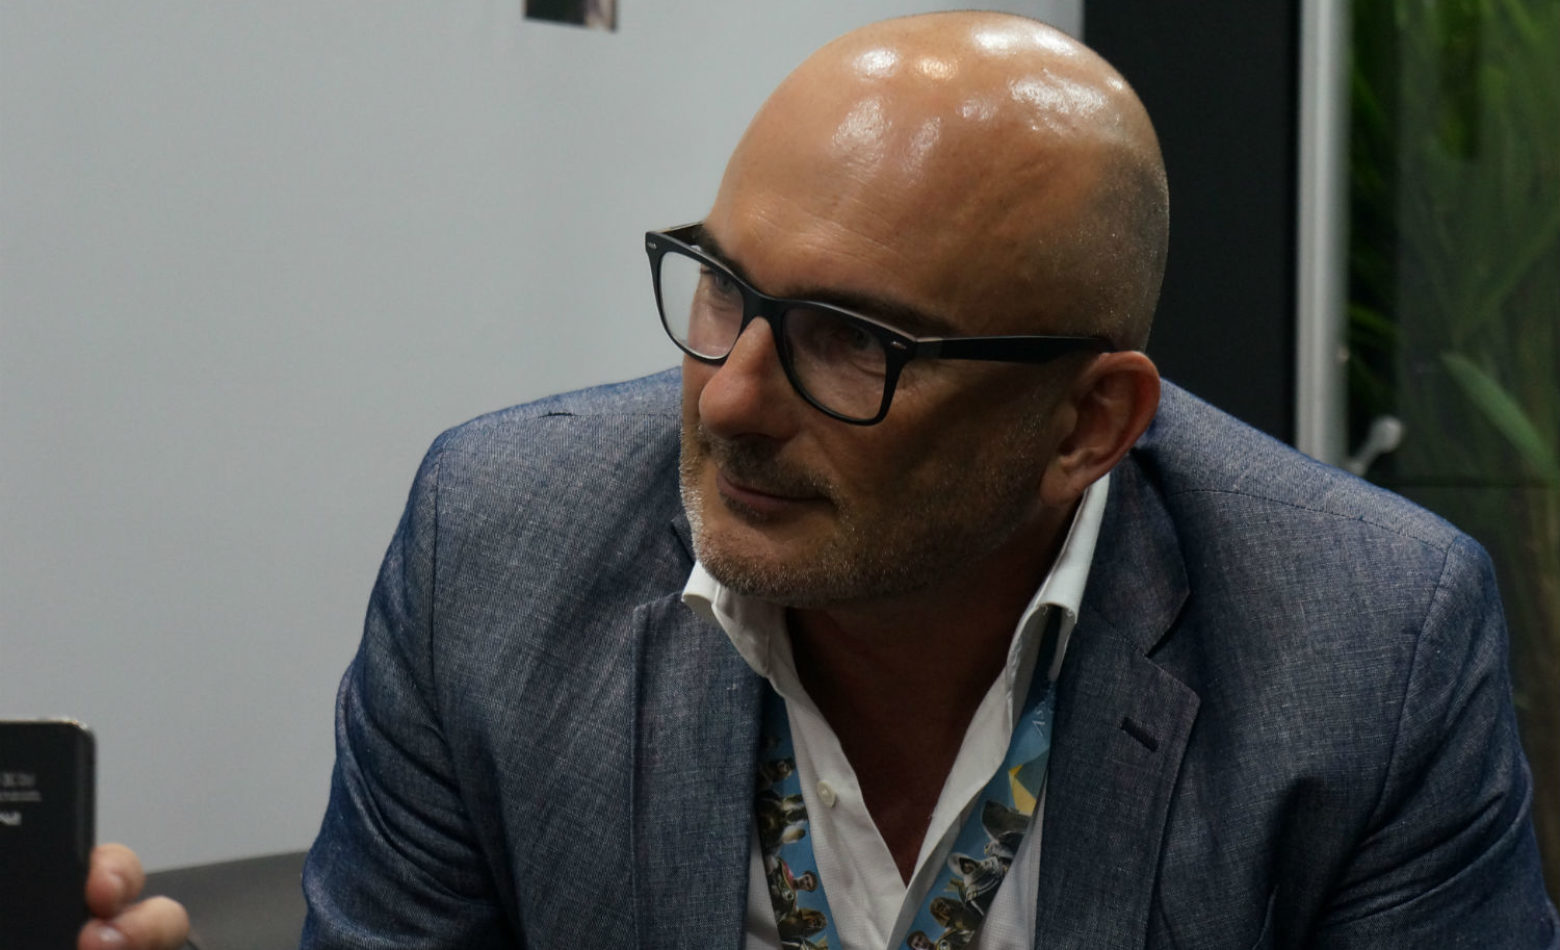 Bertrand Chaverot e a Ubisoft que vai além de si mesma [Entrevista]